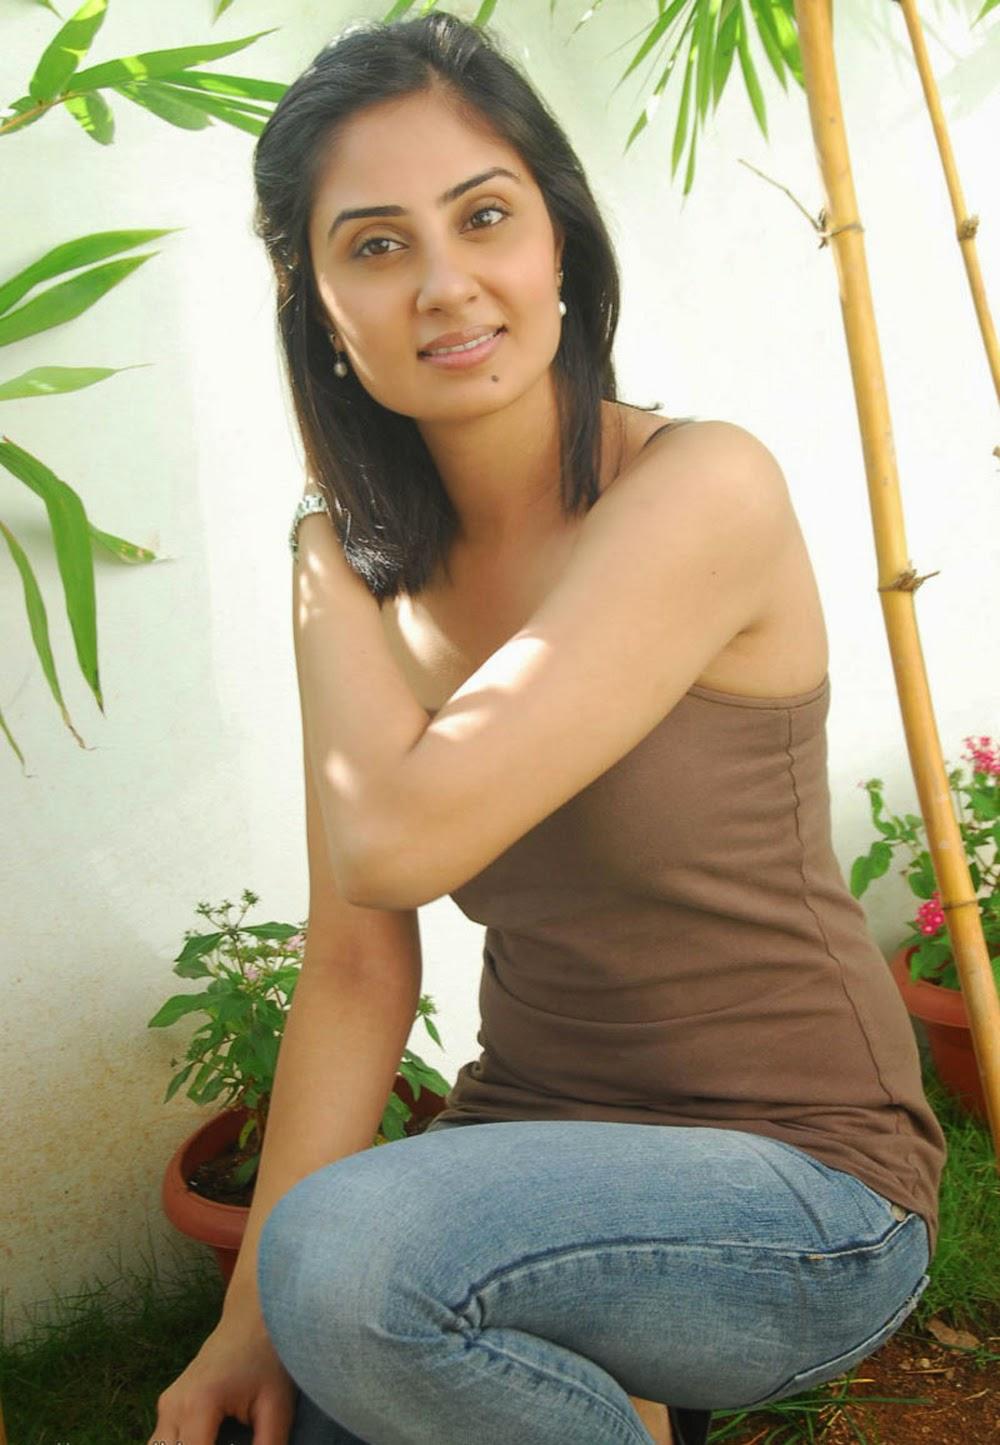 Bhanushree mehra hot images